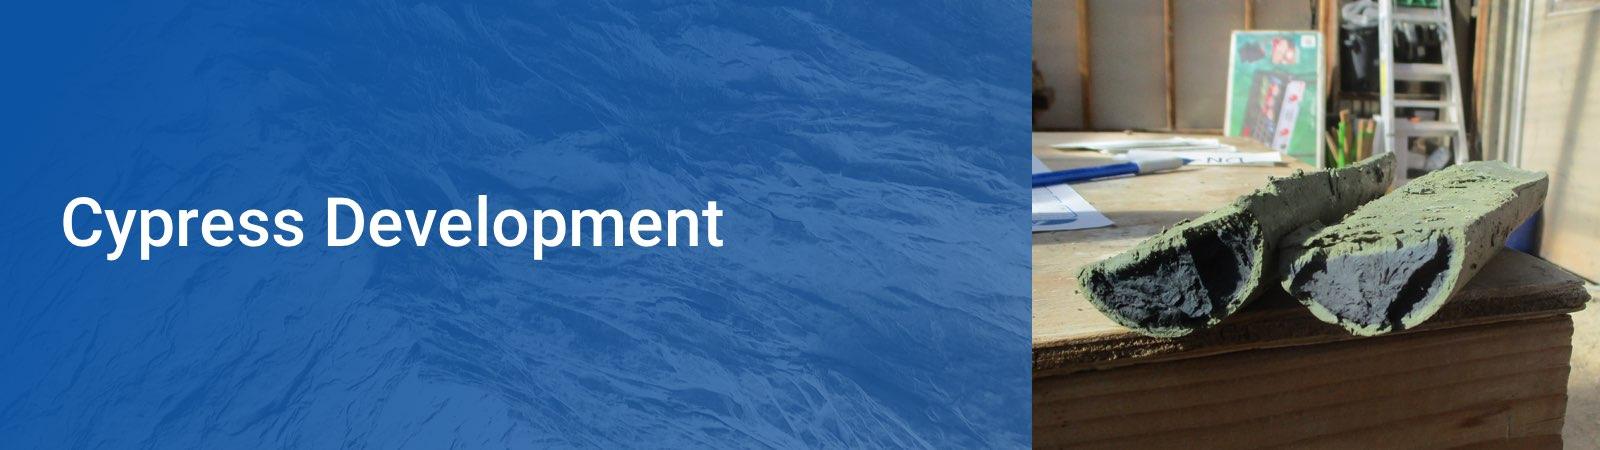 Cypress Development